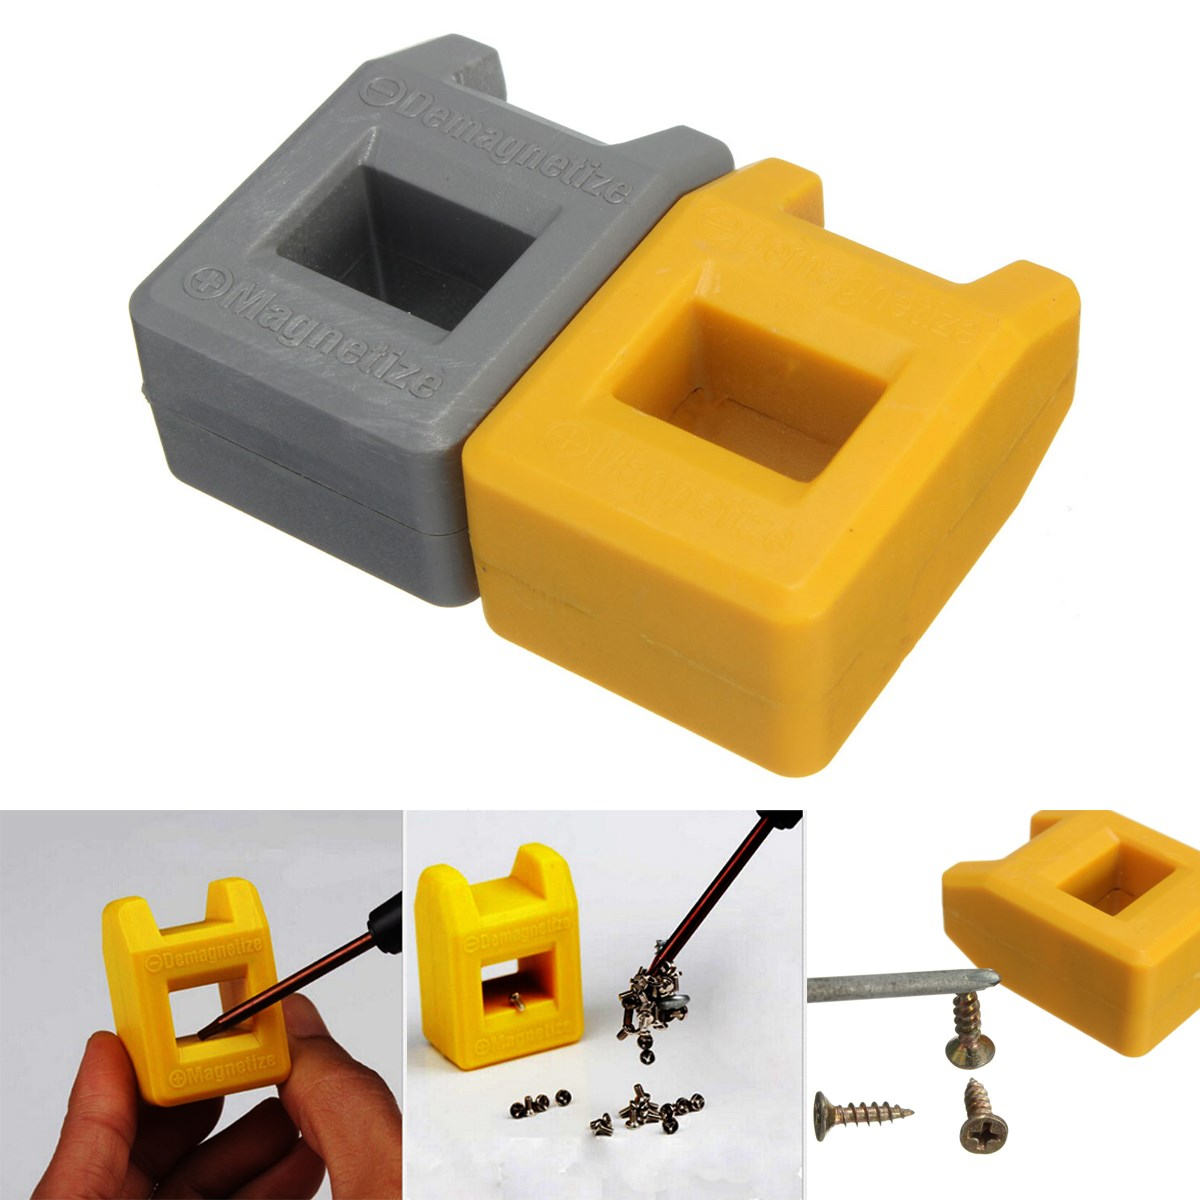 1PC 2 Color Magnetizer Demagnetizer Screwdriver Tips Screw Driver Magnetic Tool Best Price orange 5mm hole dia screwdriver bit magnetizer demagnetizer ring 2 pcs